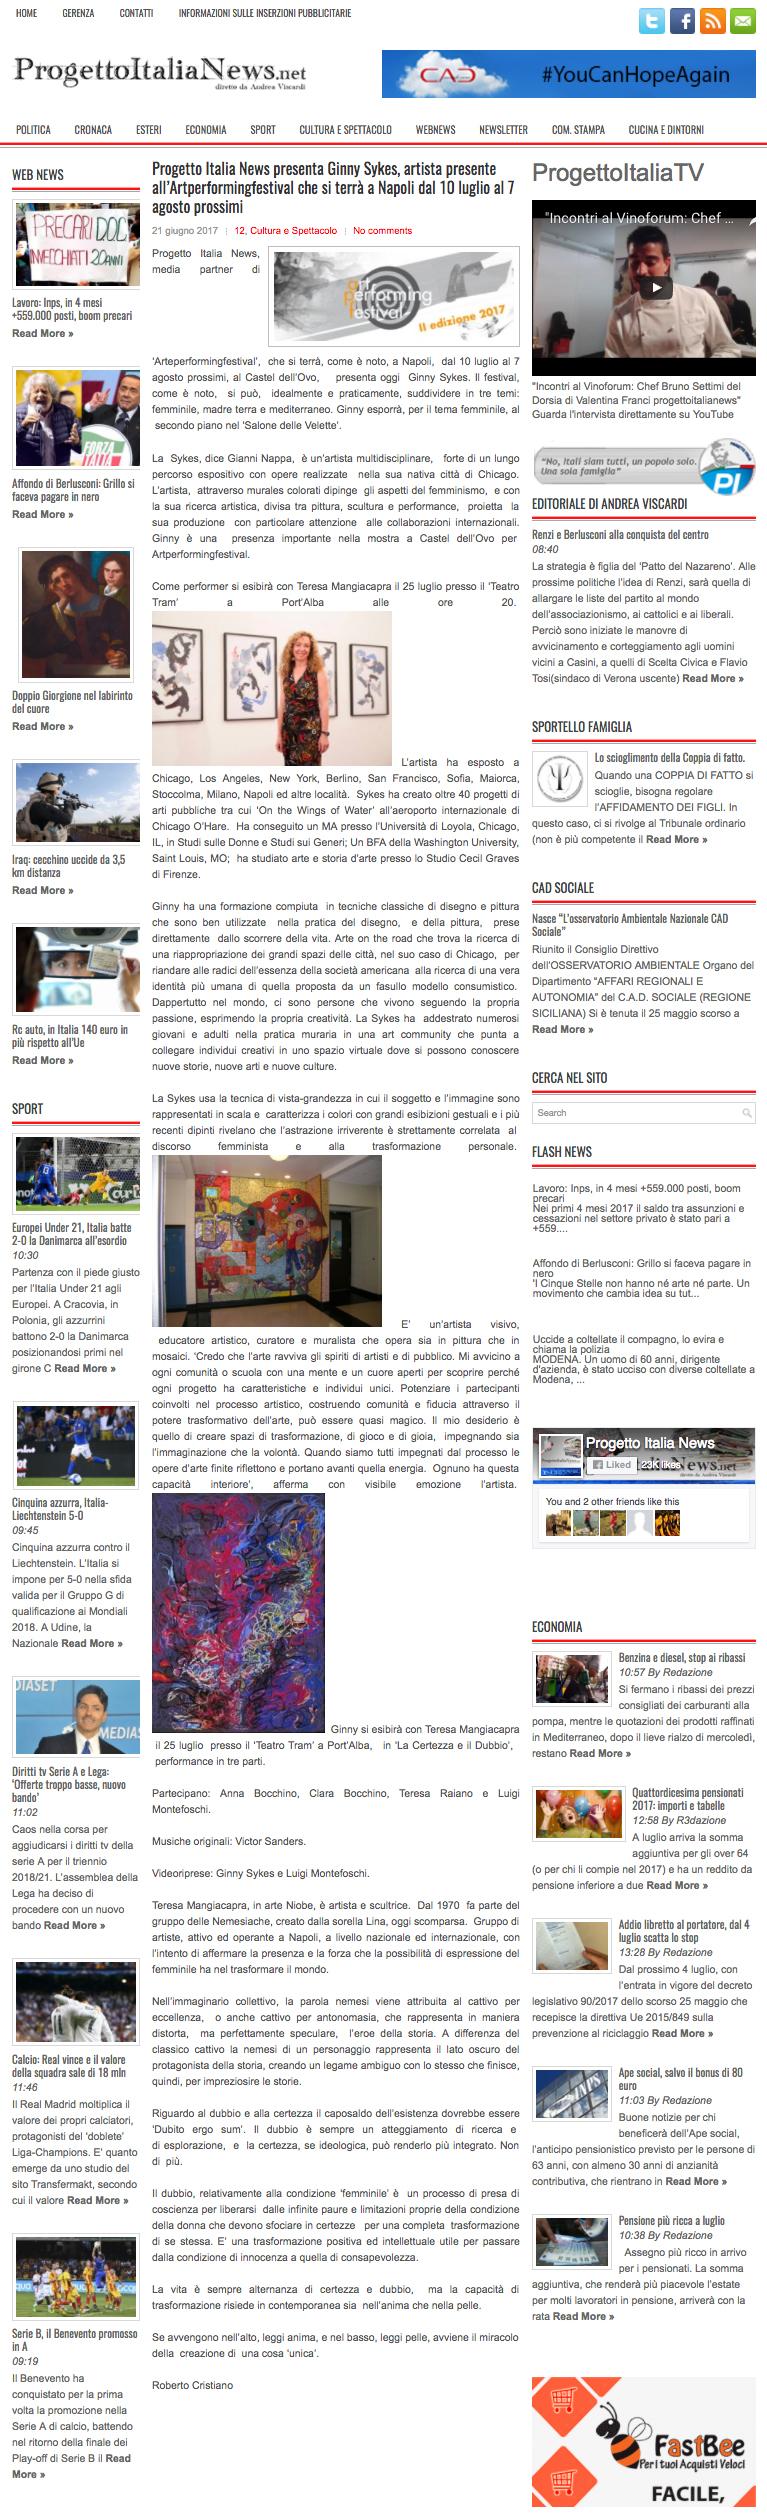 ProgettoItaliaNews.jpg